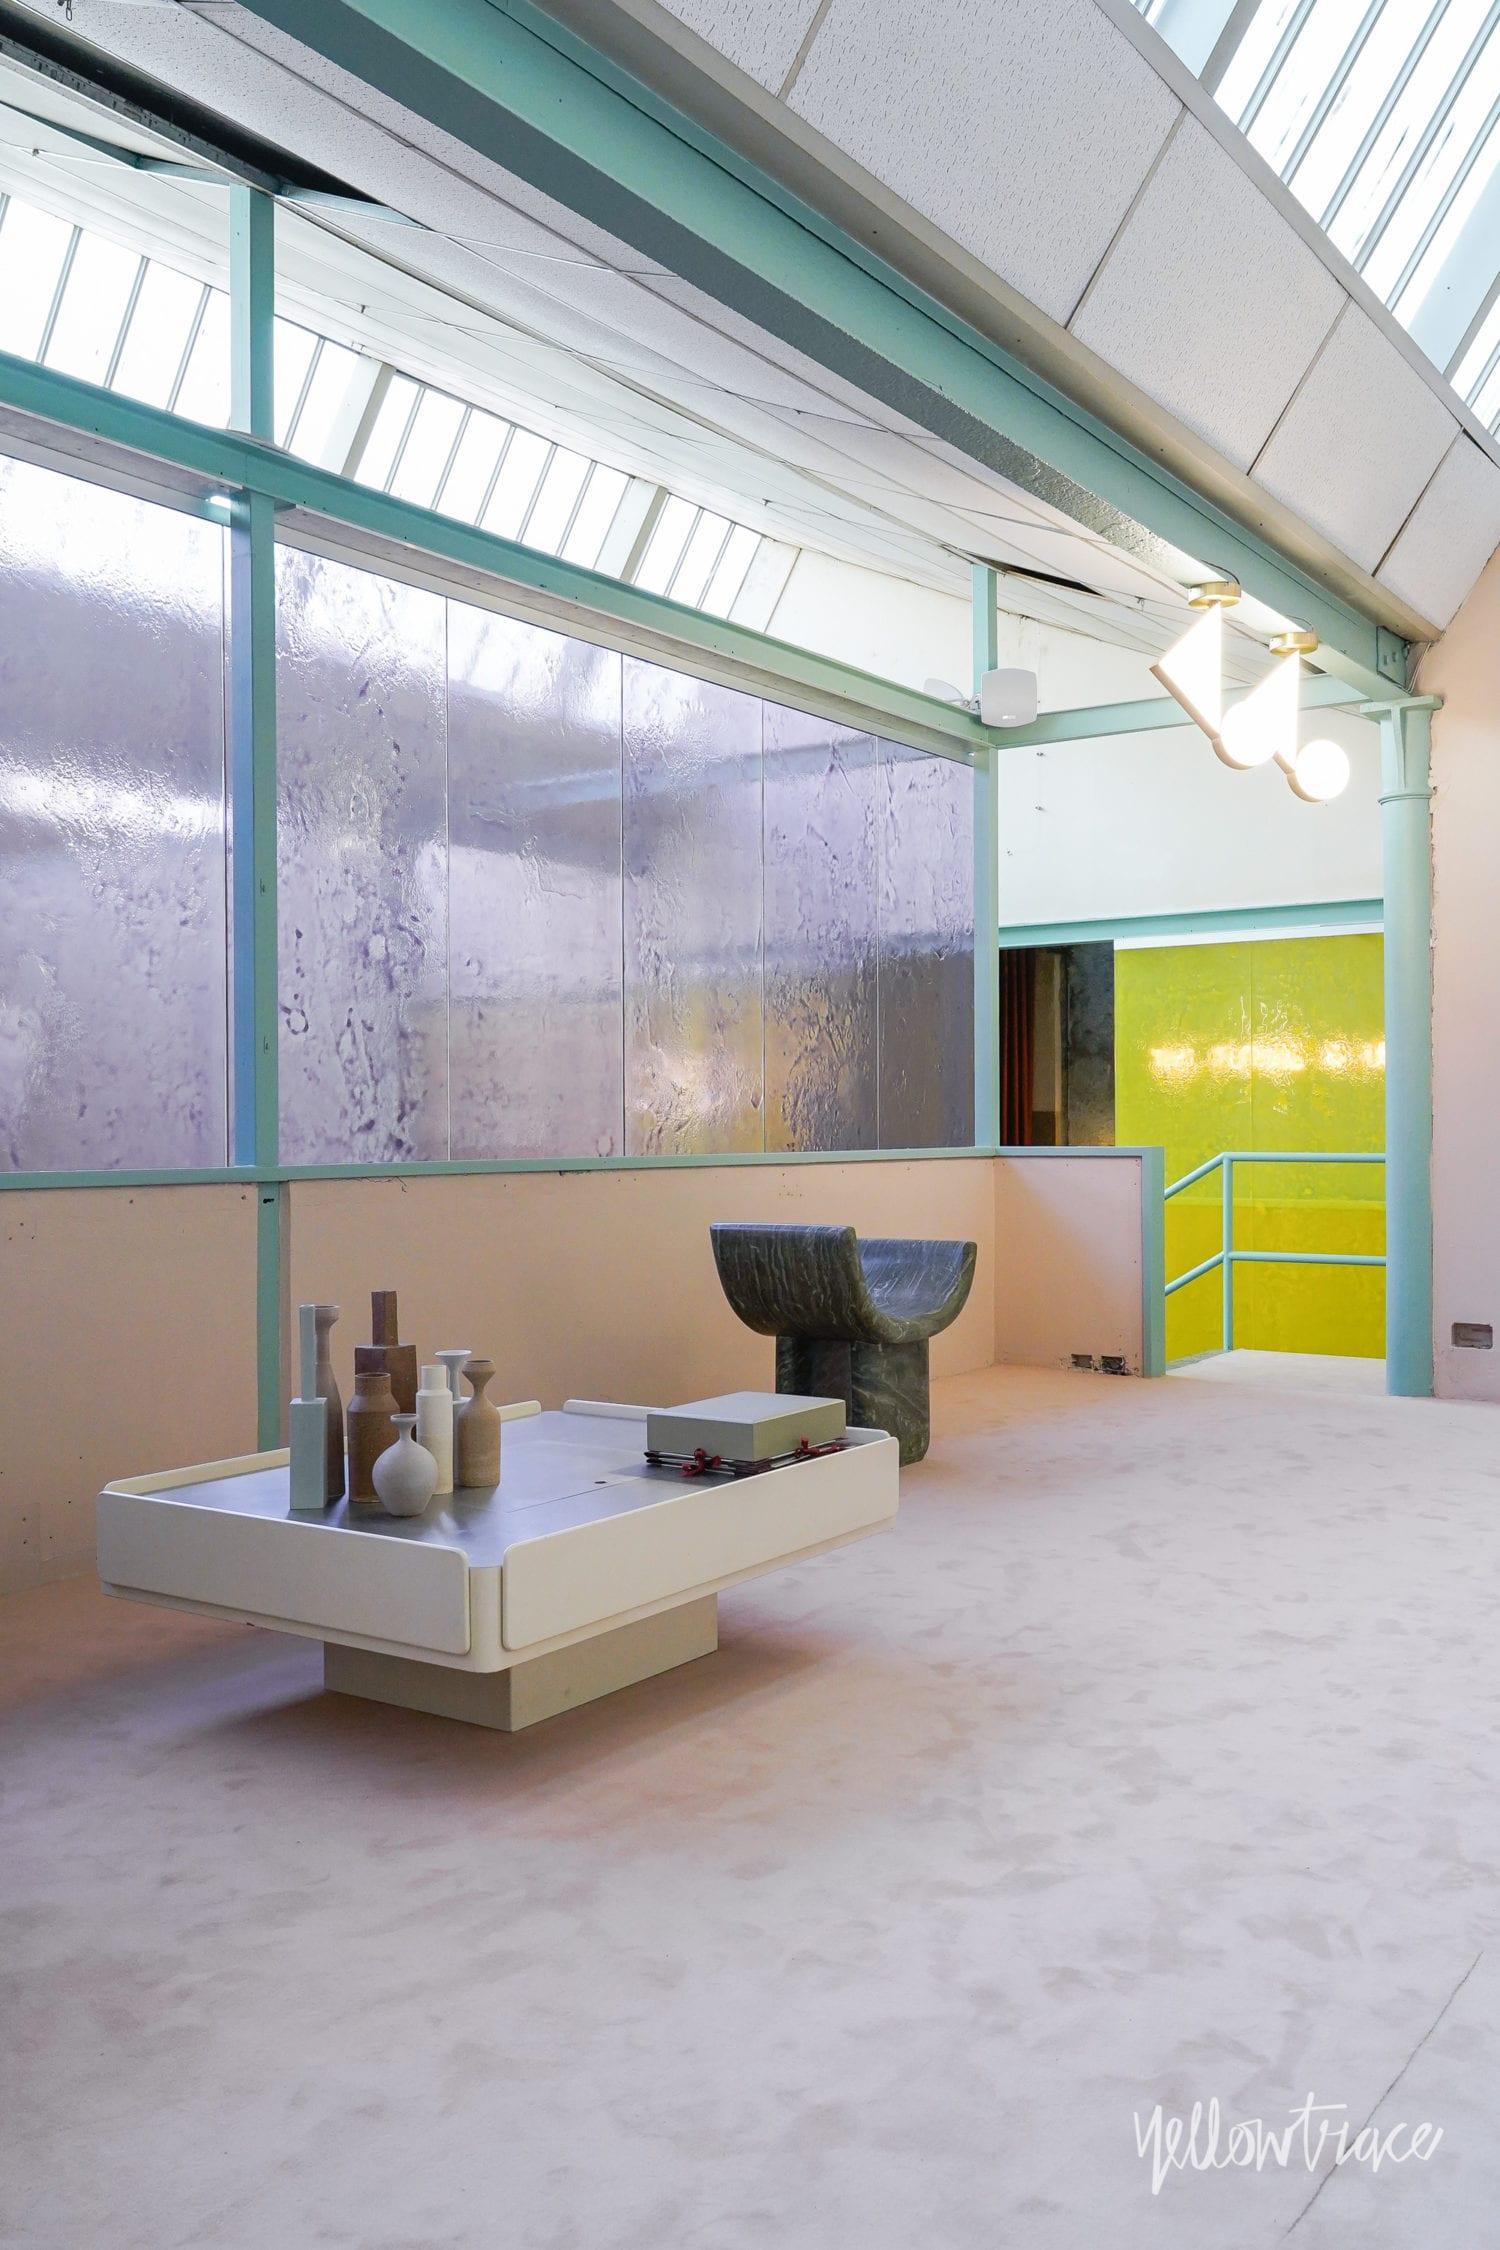 Les Arcanistes Studiopepe At Milan Design Week 2019 Photo Nick Hughes Yellowtrace 11